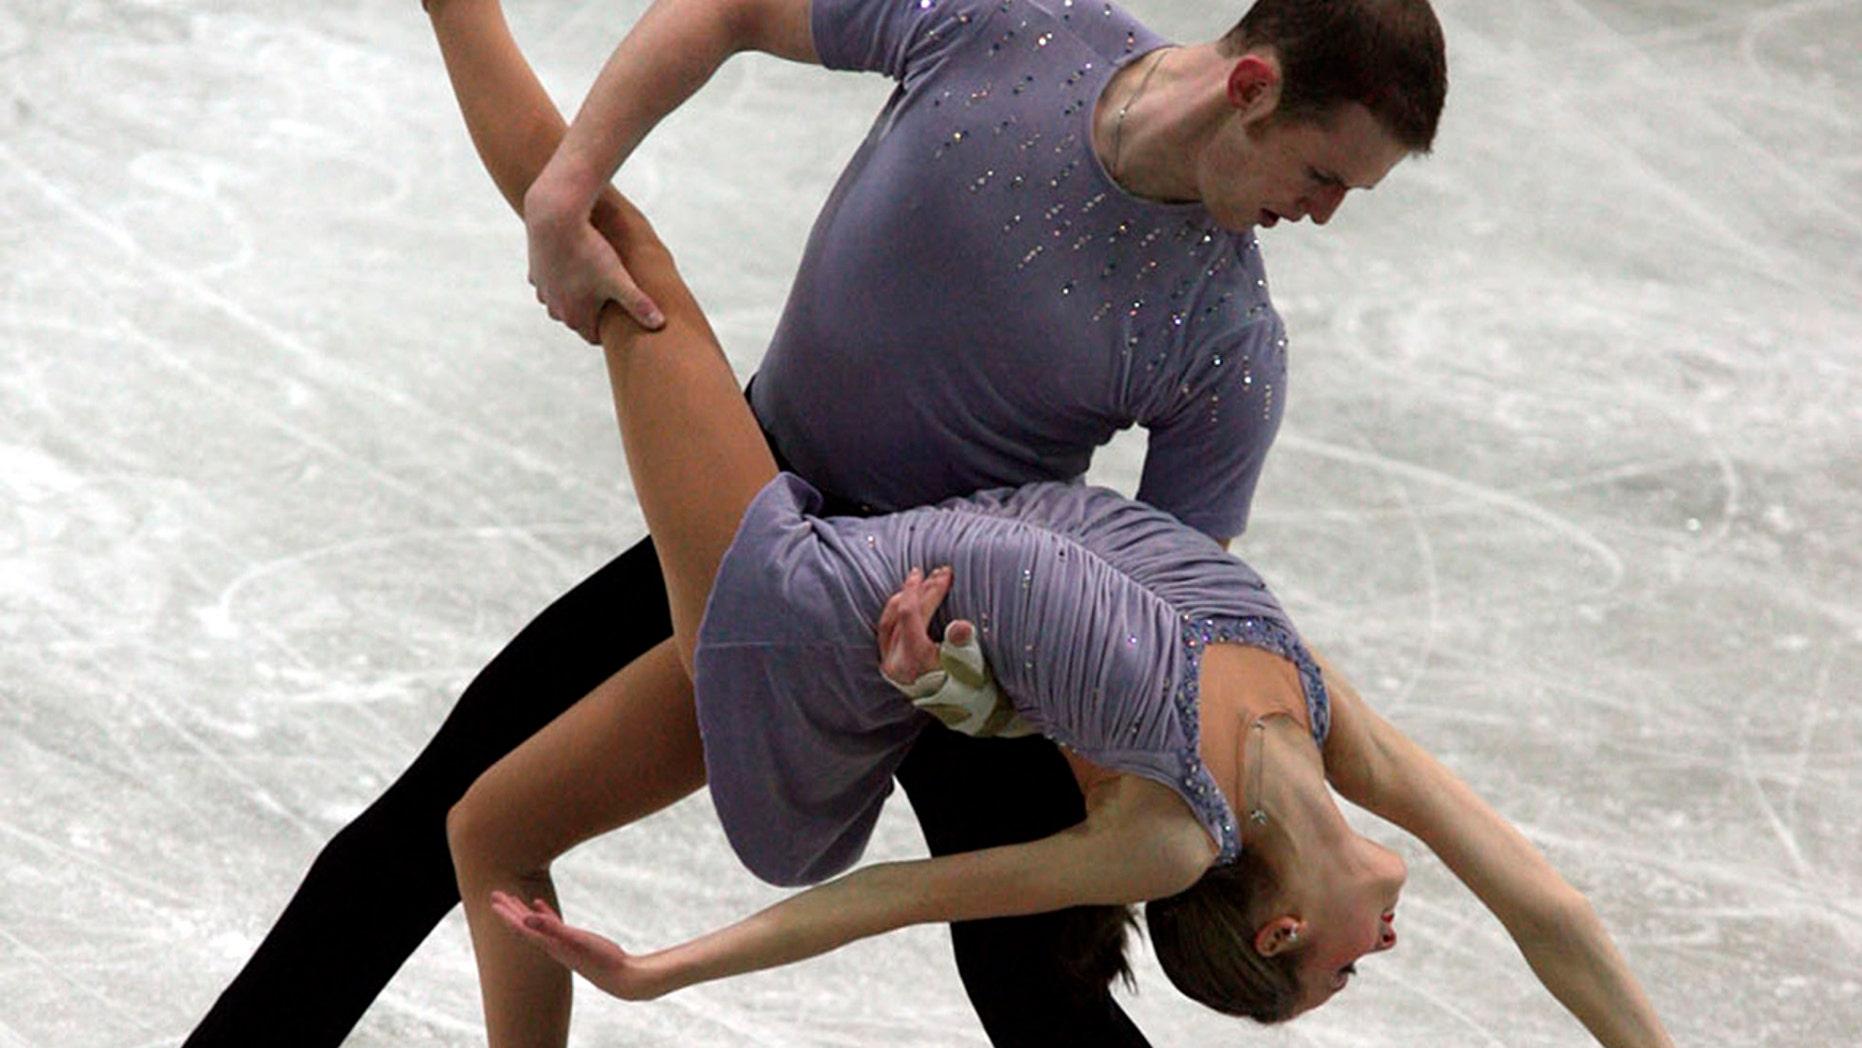 FILE - In this Dec. 8, 2006, file photo, Bridget Namiotka and John Coughlin perform during the ISU Junior Grand Prix of Figure Skating Final in Sofia, Bulgaria. (AP Photo/File)